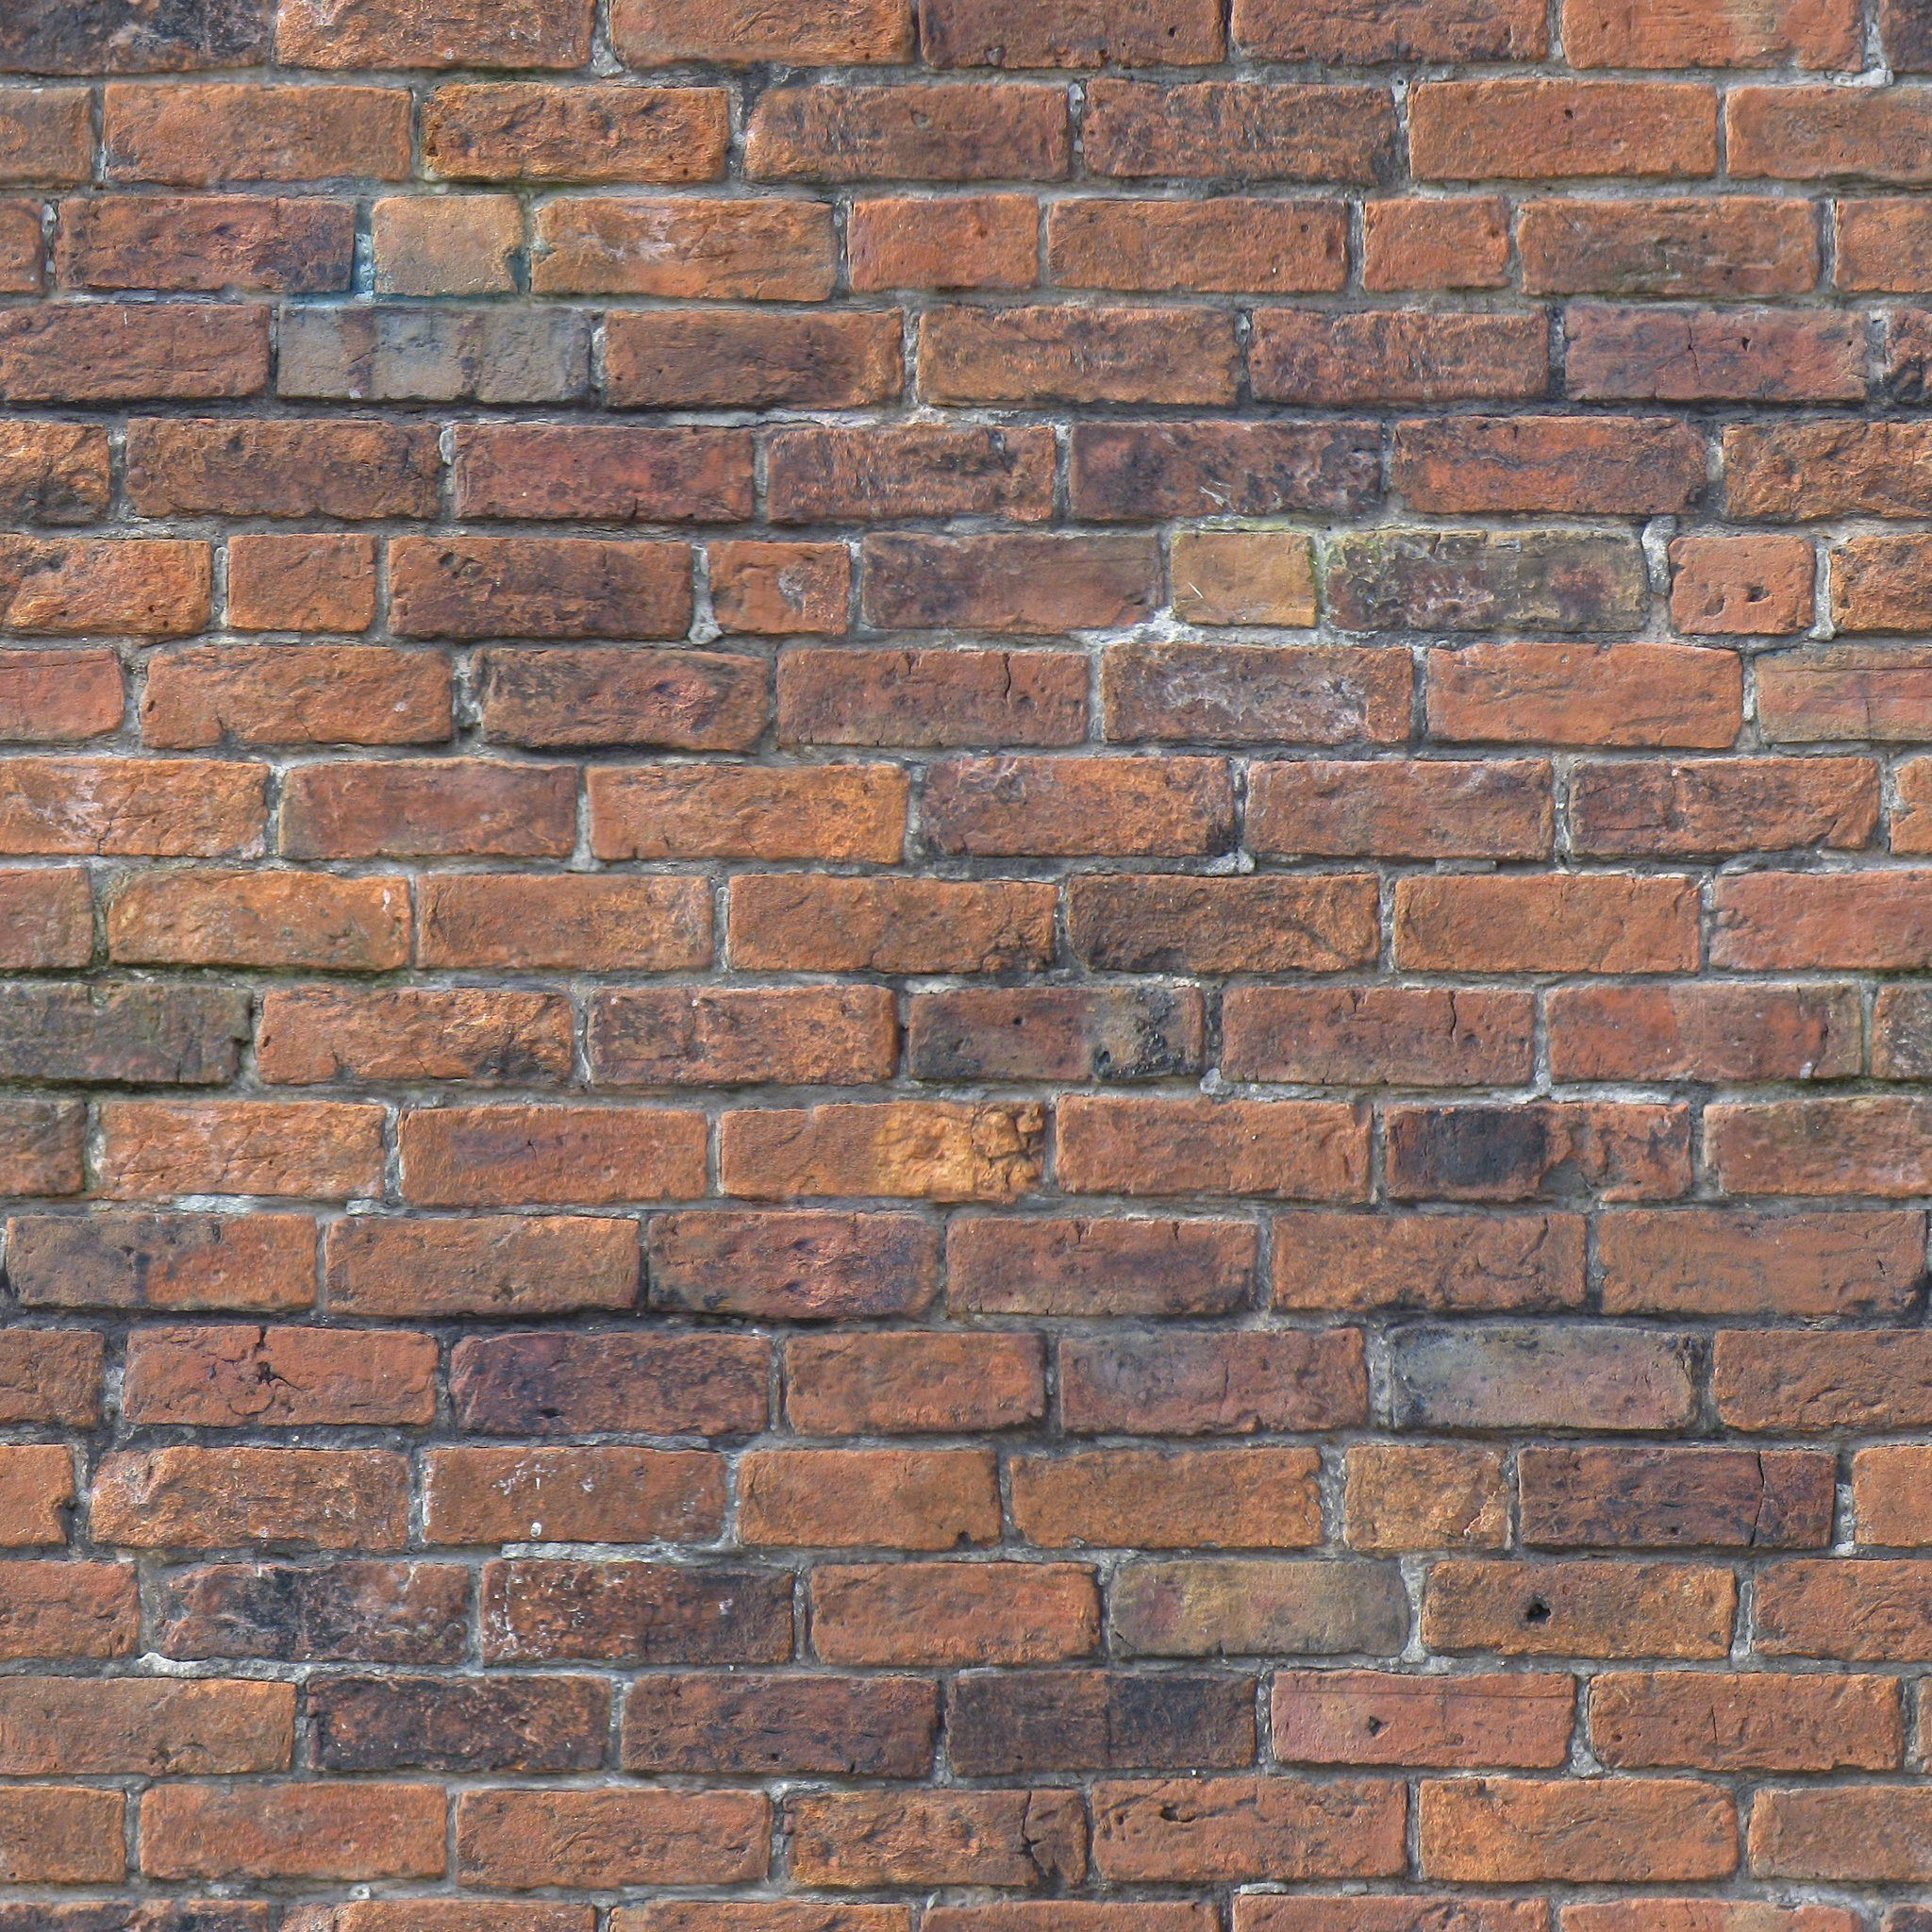 Brick 14 Uv H Cm 2048 2048 Iida 2016 Comp Pinterest Bricks Barbershop Design And